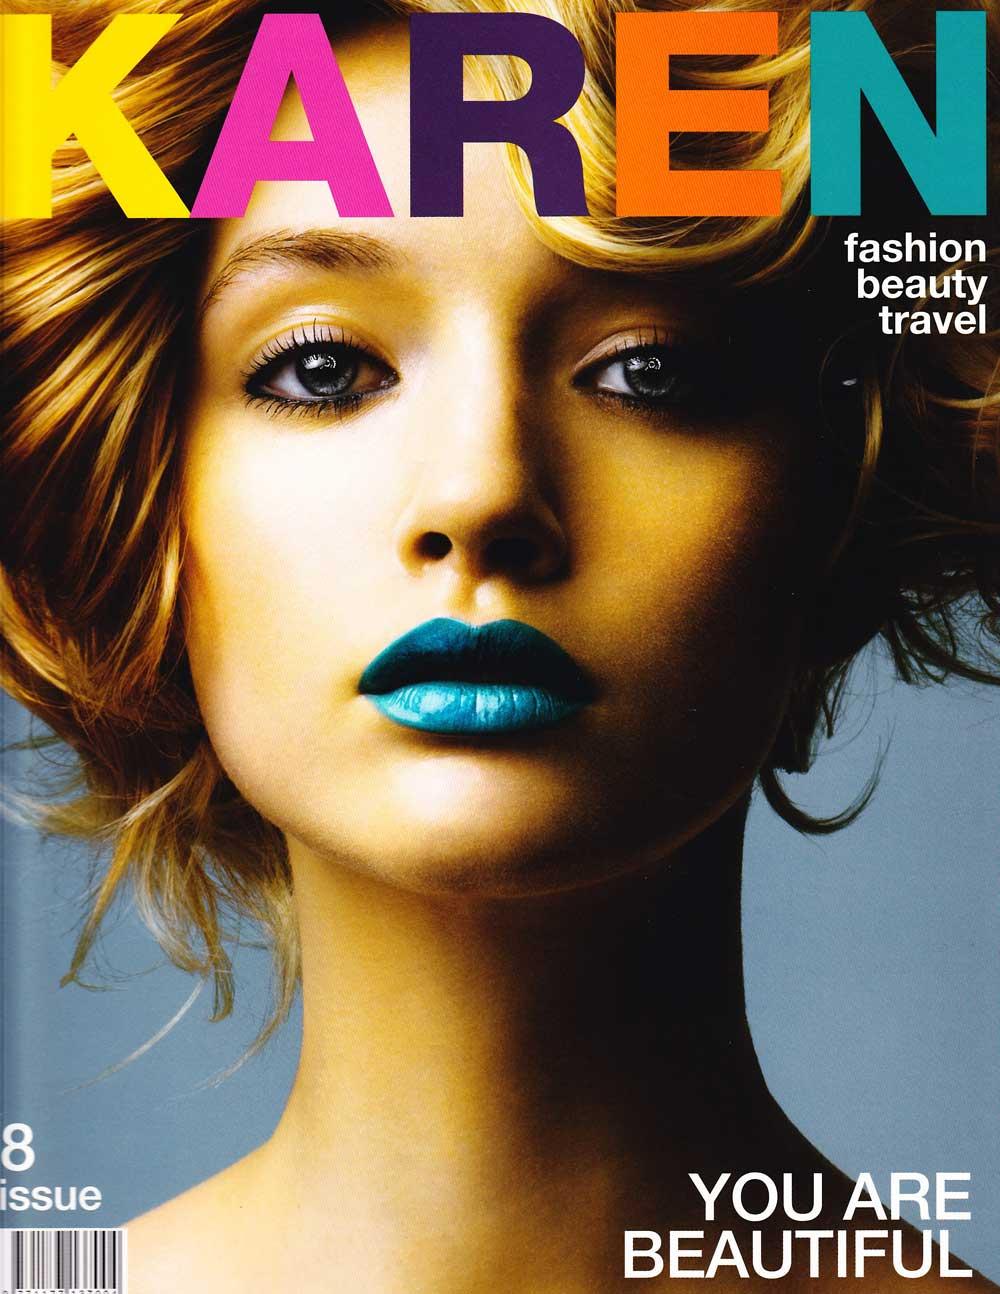 Karen Magazine 2009 press